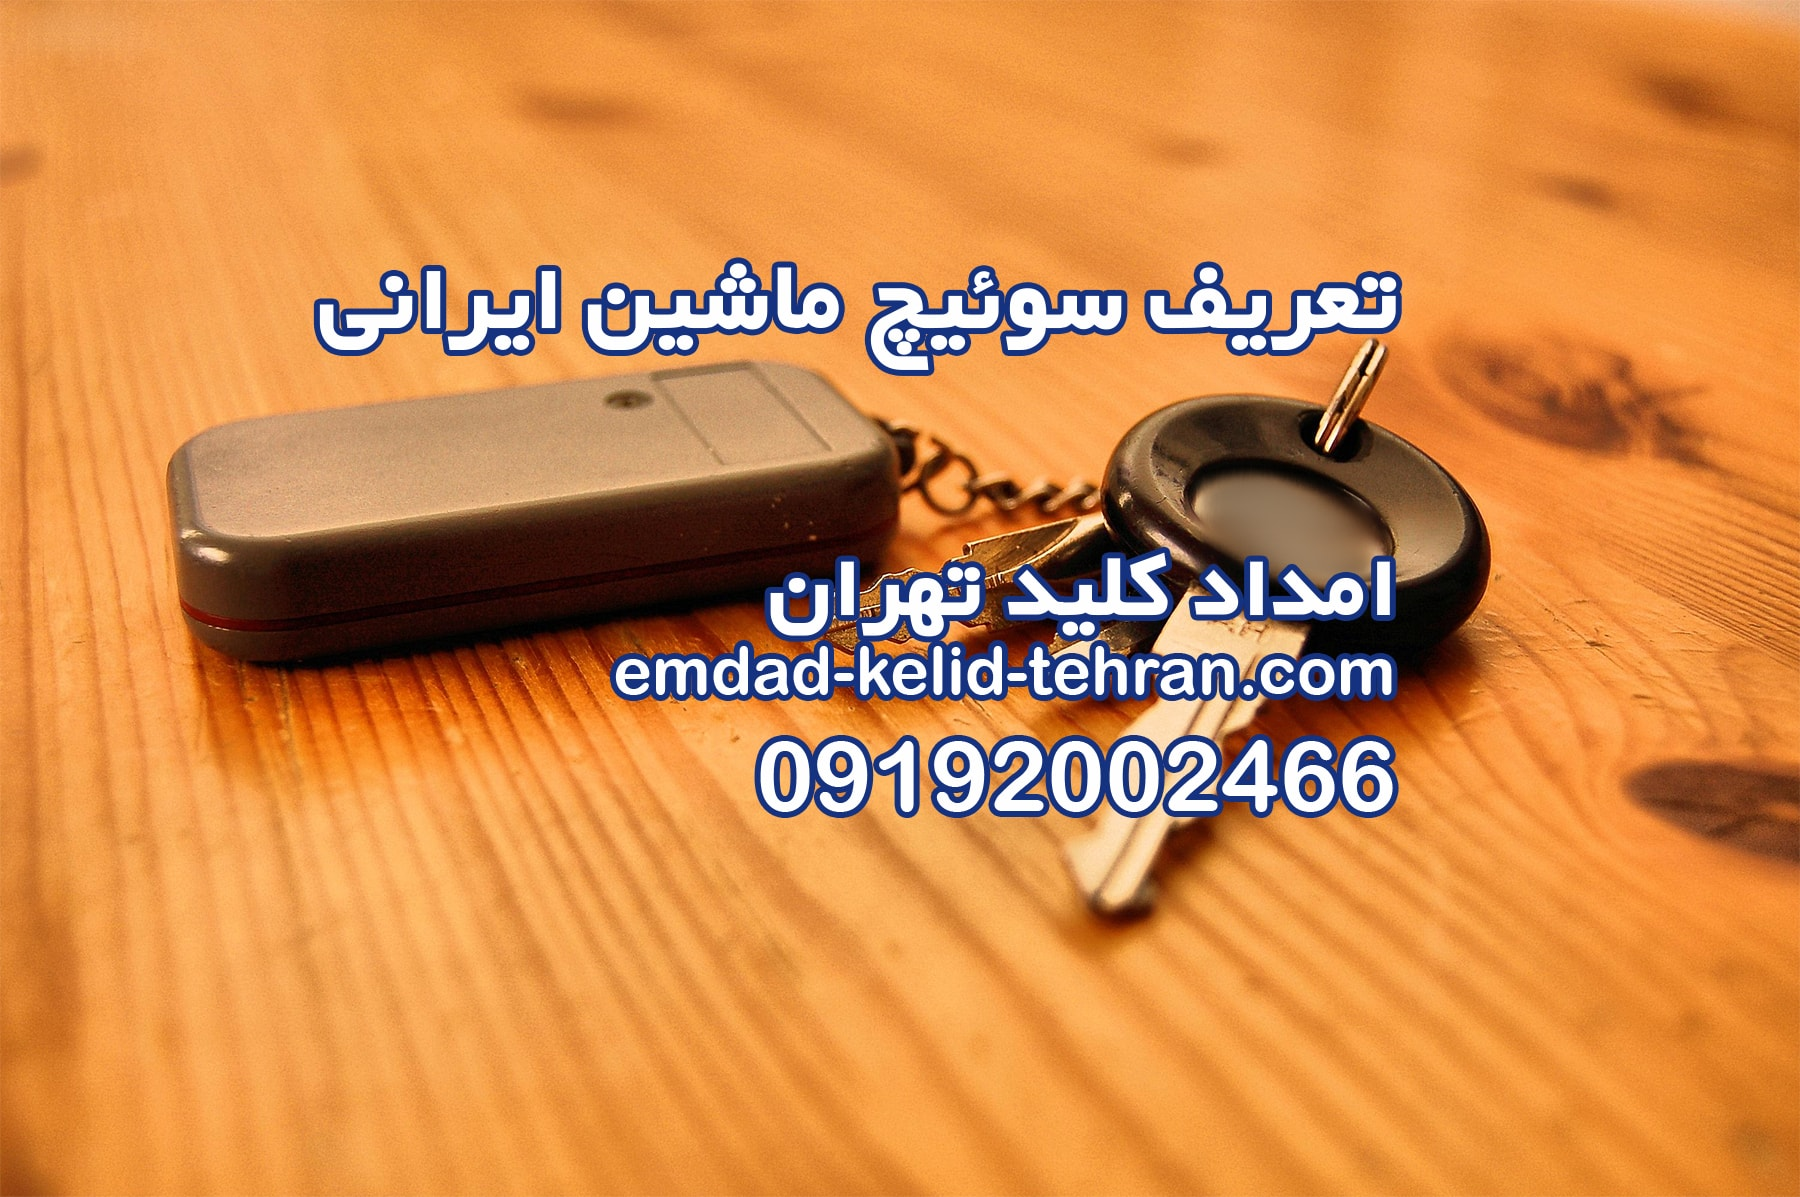 تعریف سوئیچ ماشین ایرانی